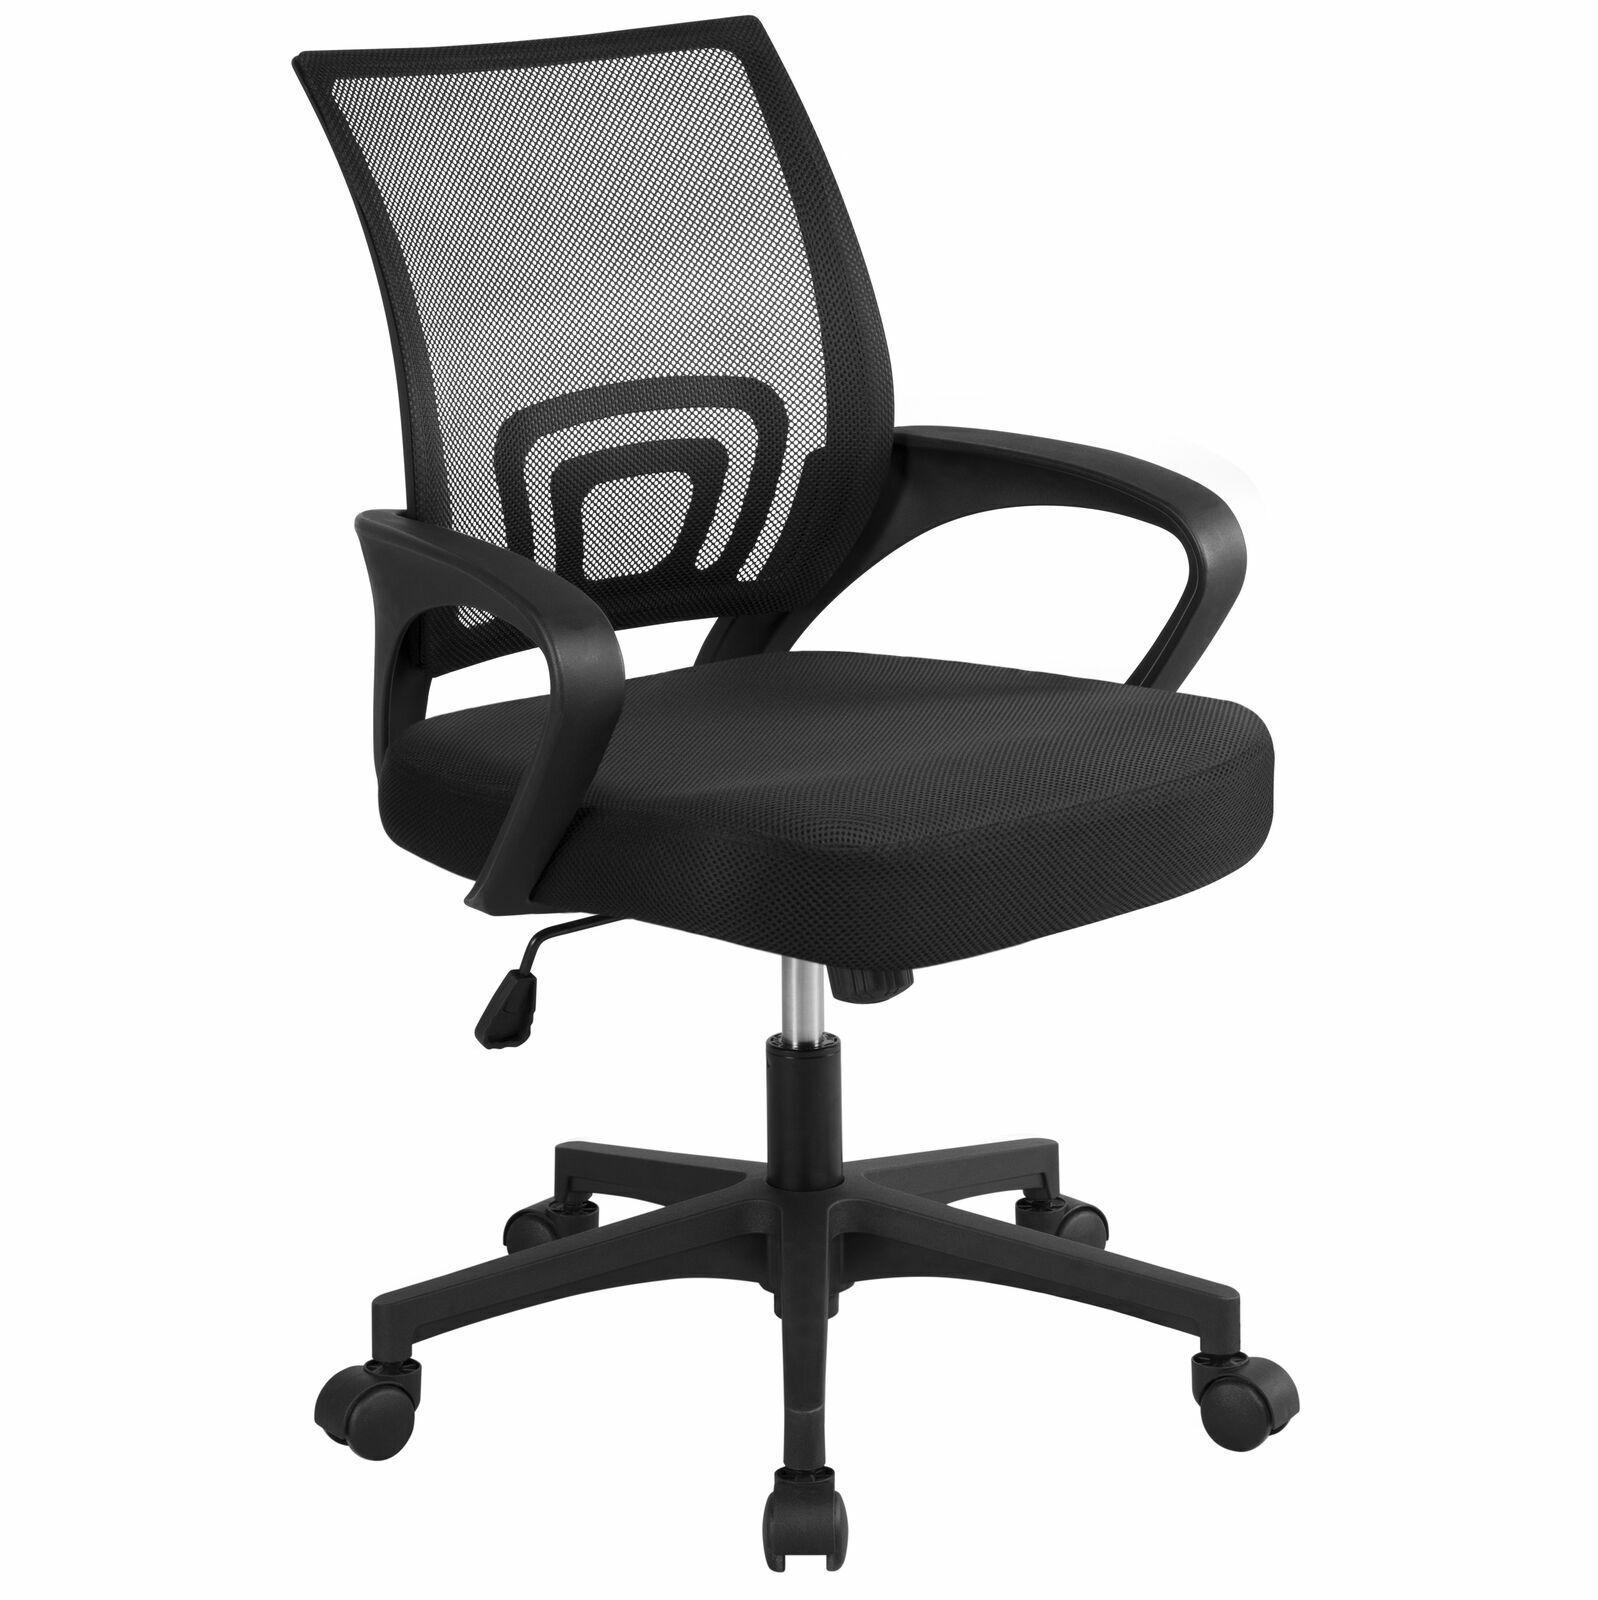 Executive Ergonomic Mesh Computer Office Desk Task Mid-back